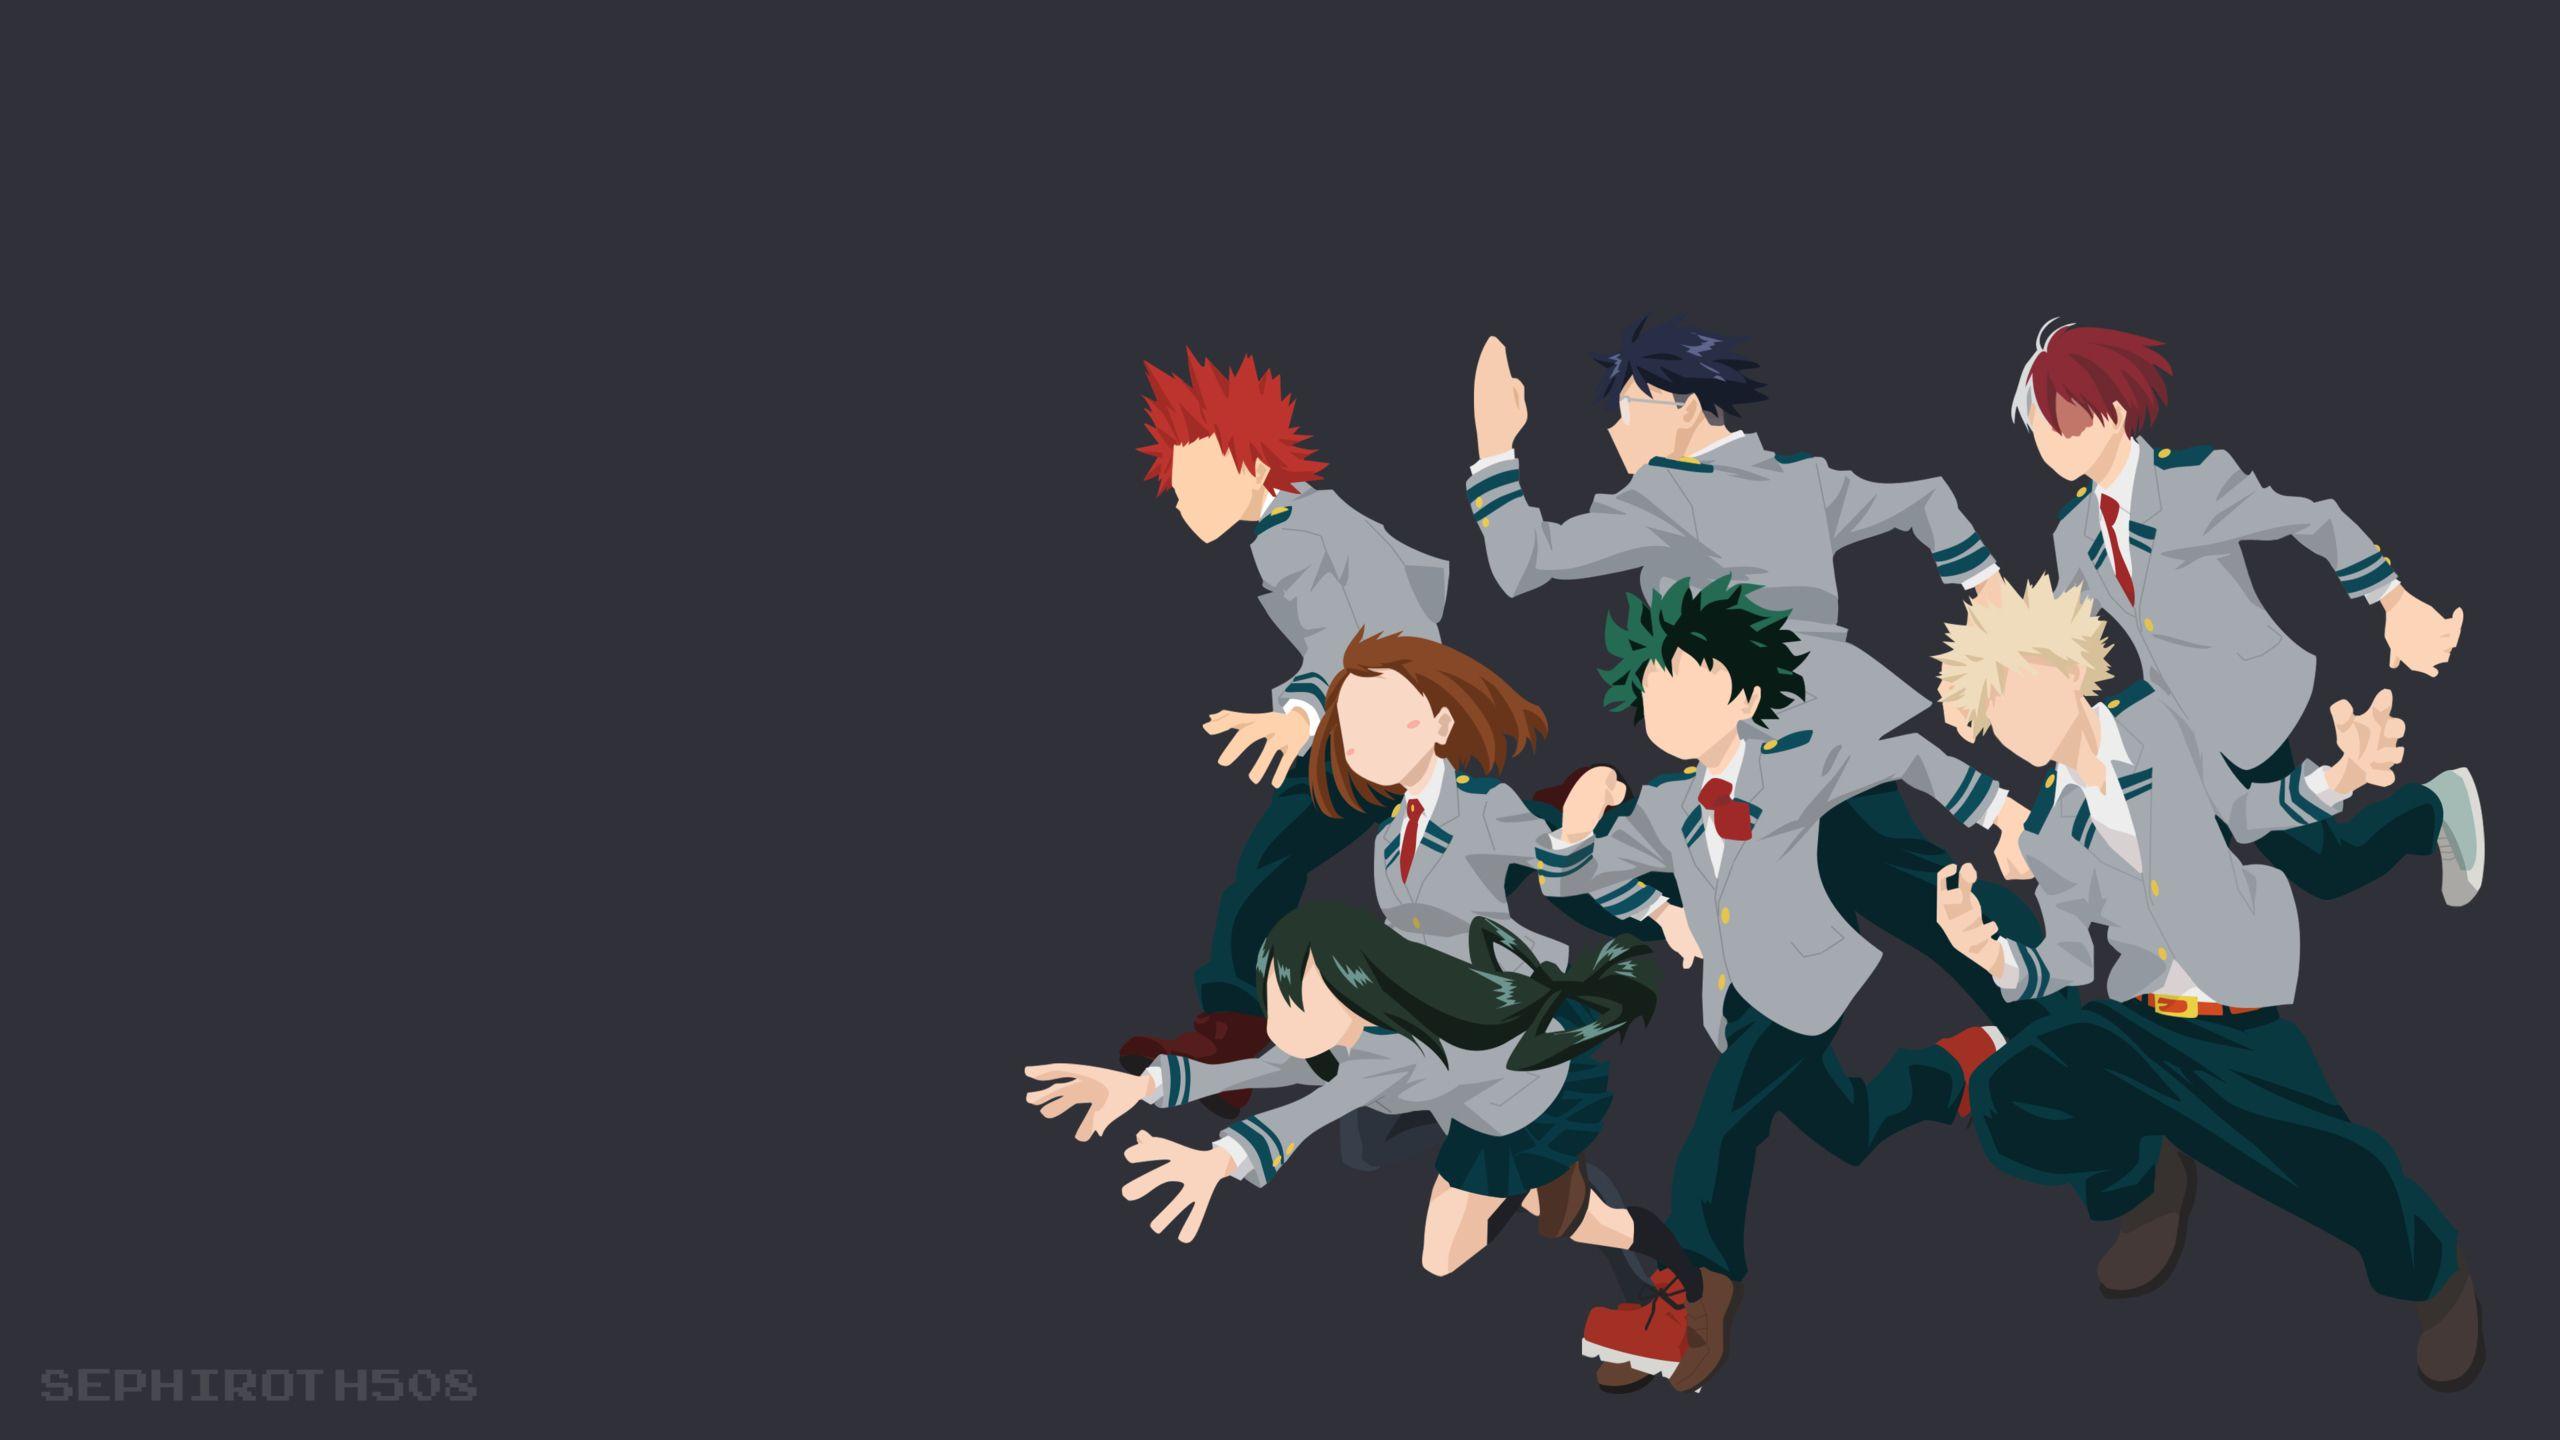 My Hero Academia Anime Uhd 4k Wallpaper 3840x2400 Wallpaper Ponsel